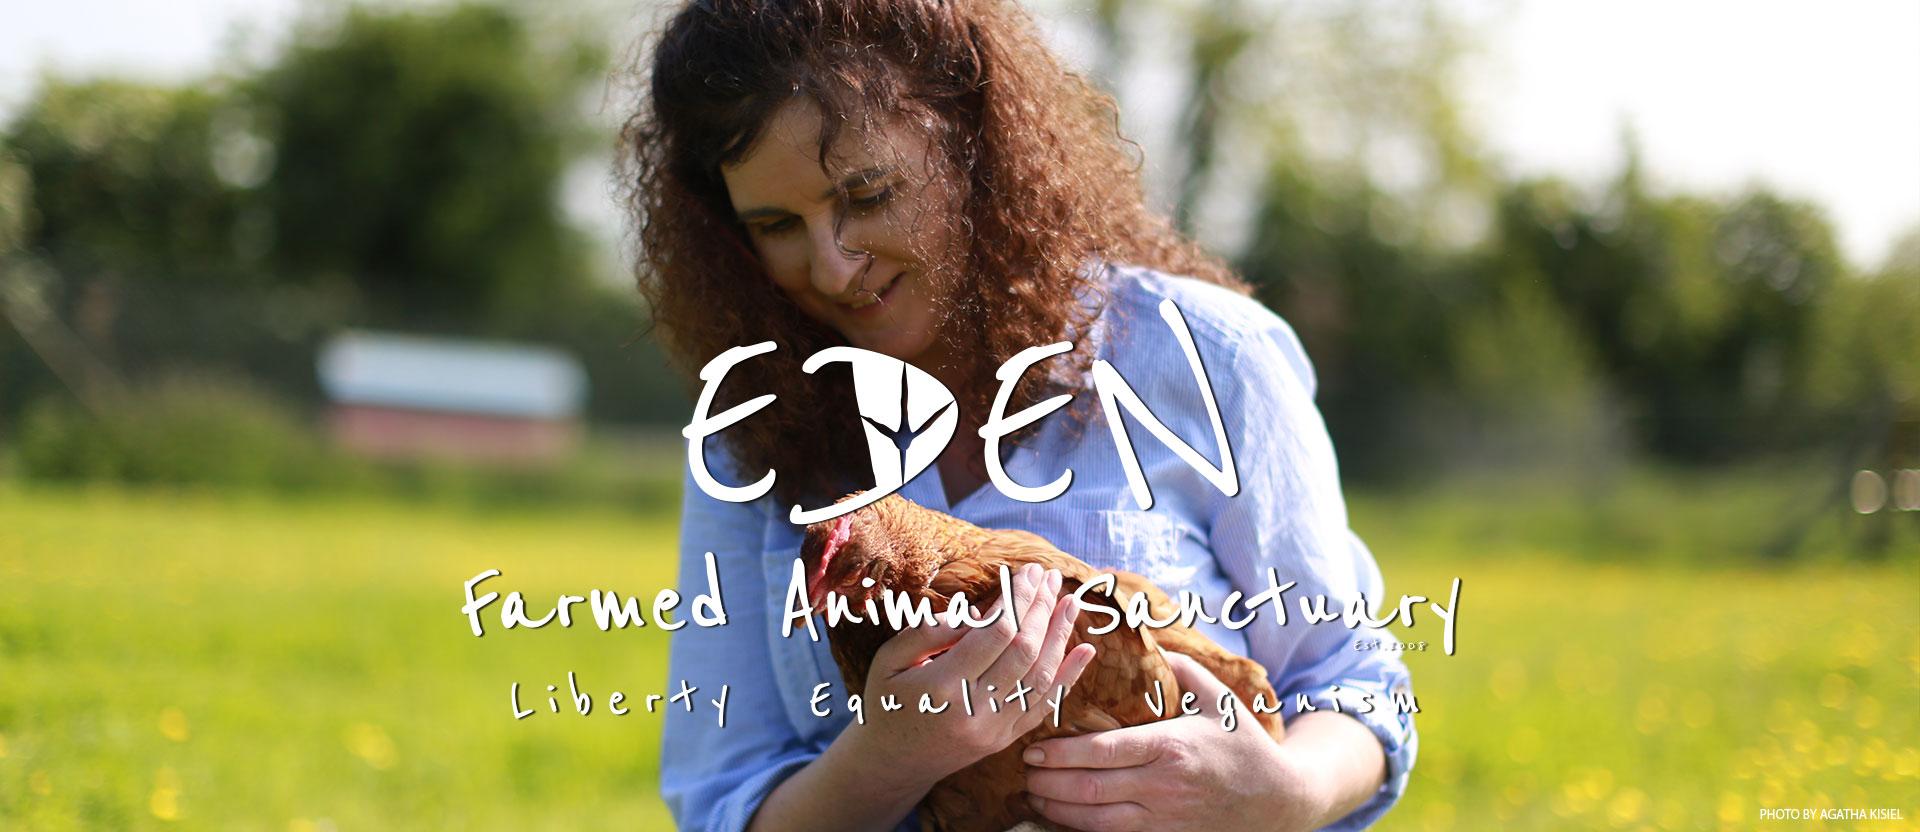 Eden Farmed Animal Sanctuary - Liberty, Equality, Vaganism